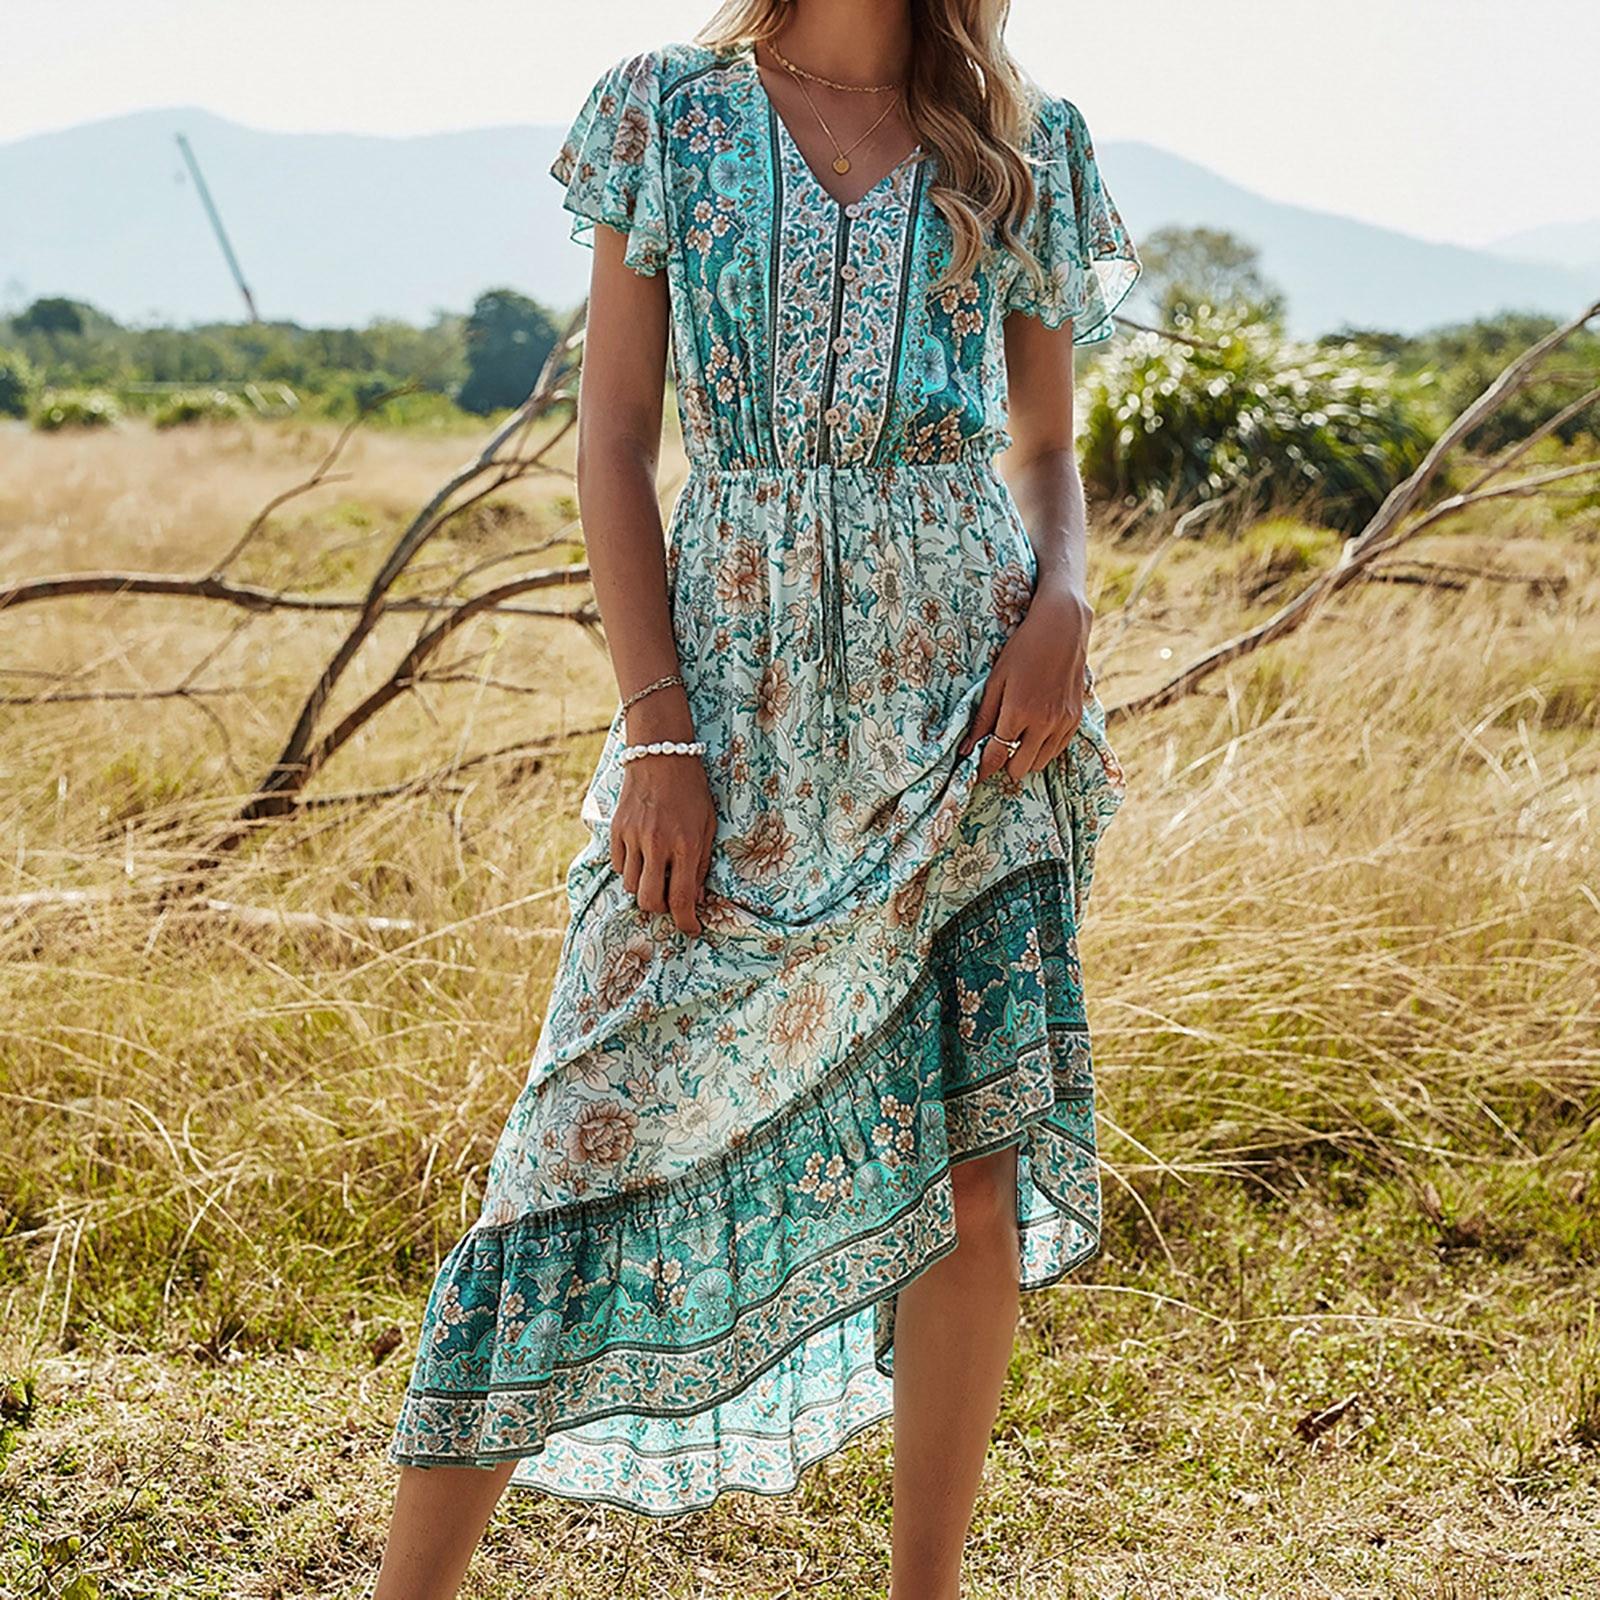 Women Summer Maxi Dress Boho Flowers Print Button Down Flare Sleeve Loose Dress Casual Dresses Woman Party Night Beach Dresses|Dresses| - AliExpress